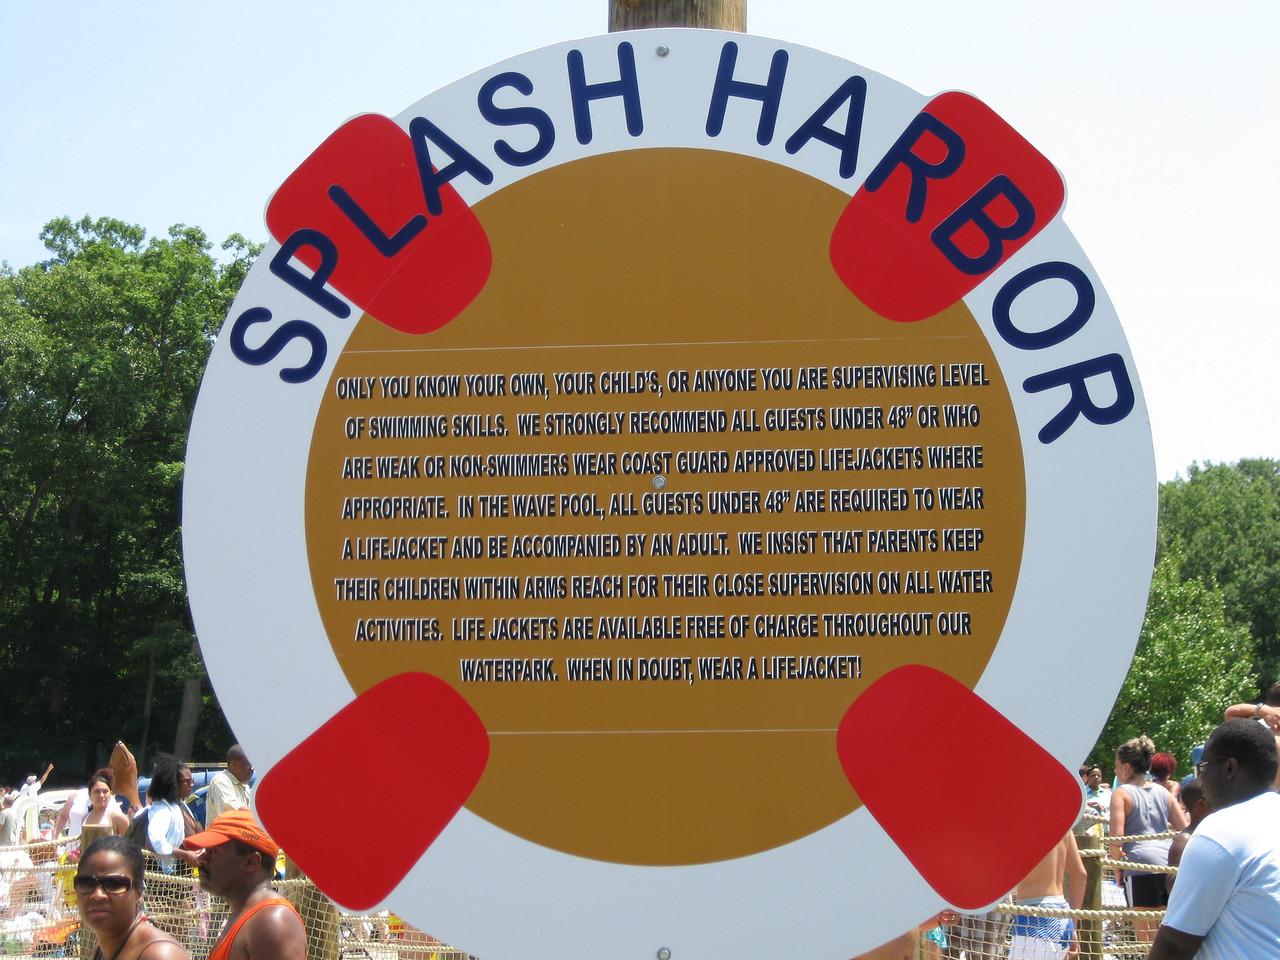 New Splash Harbor rules.